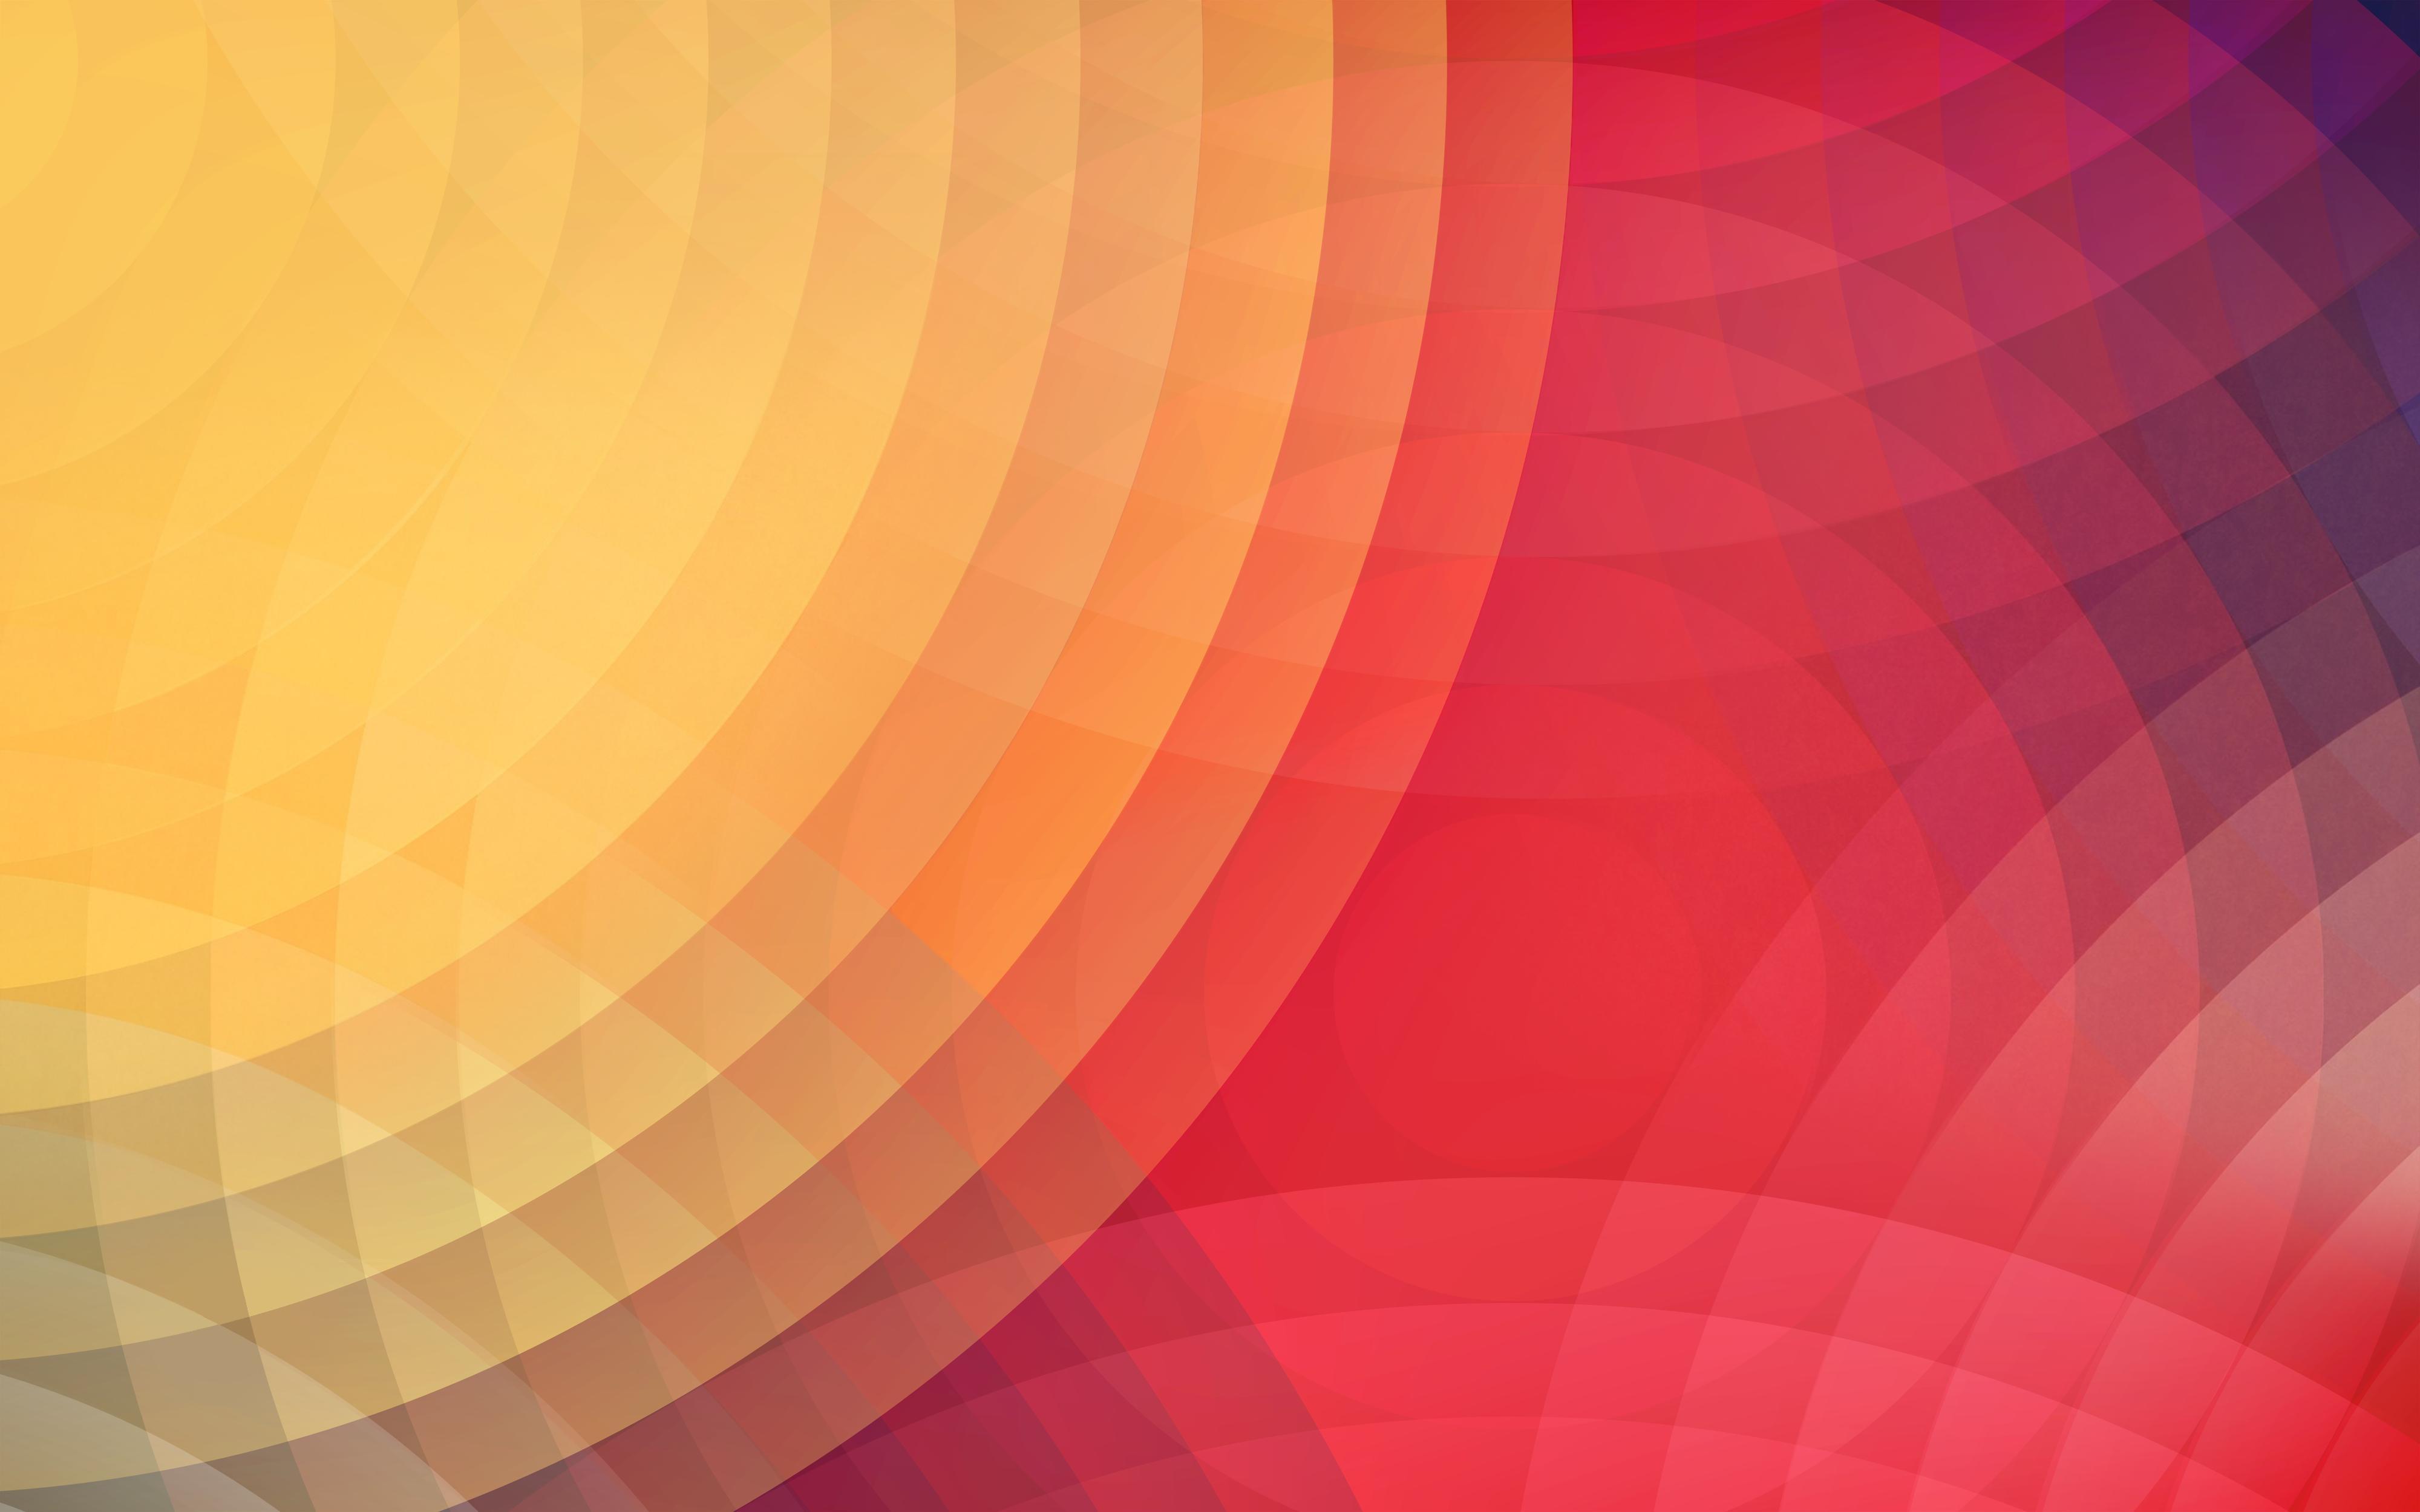 Line Color Form : Wallpaper : illustration red symmetry circle bright light